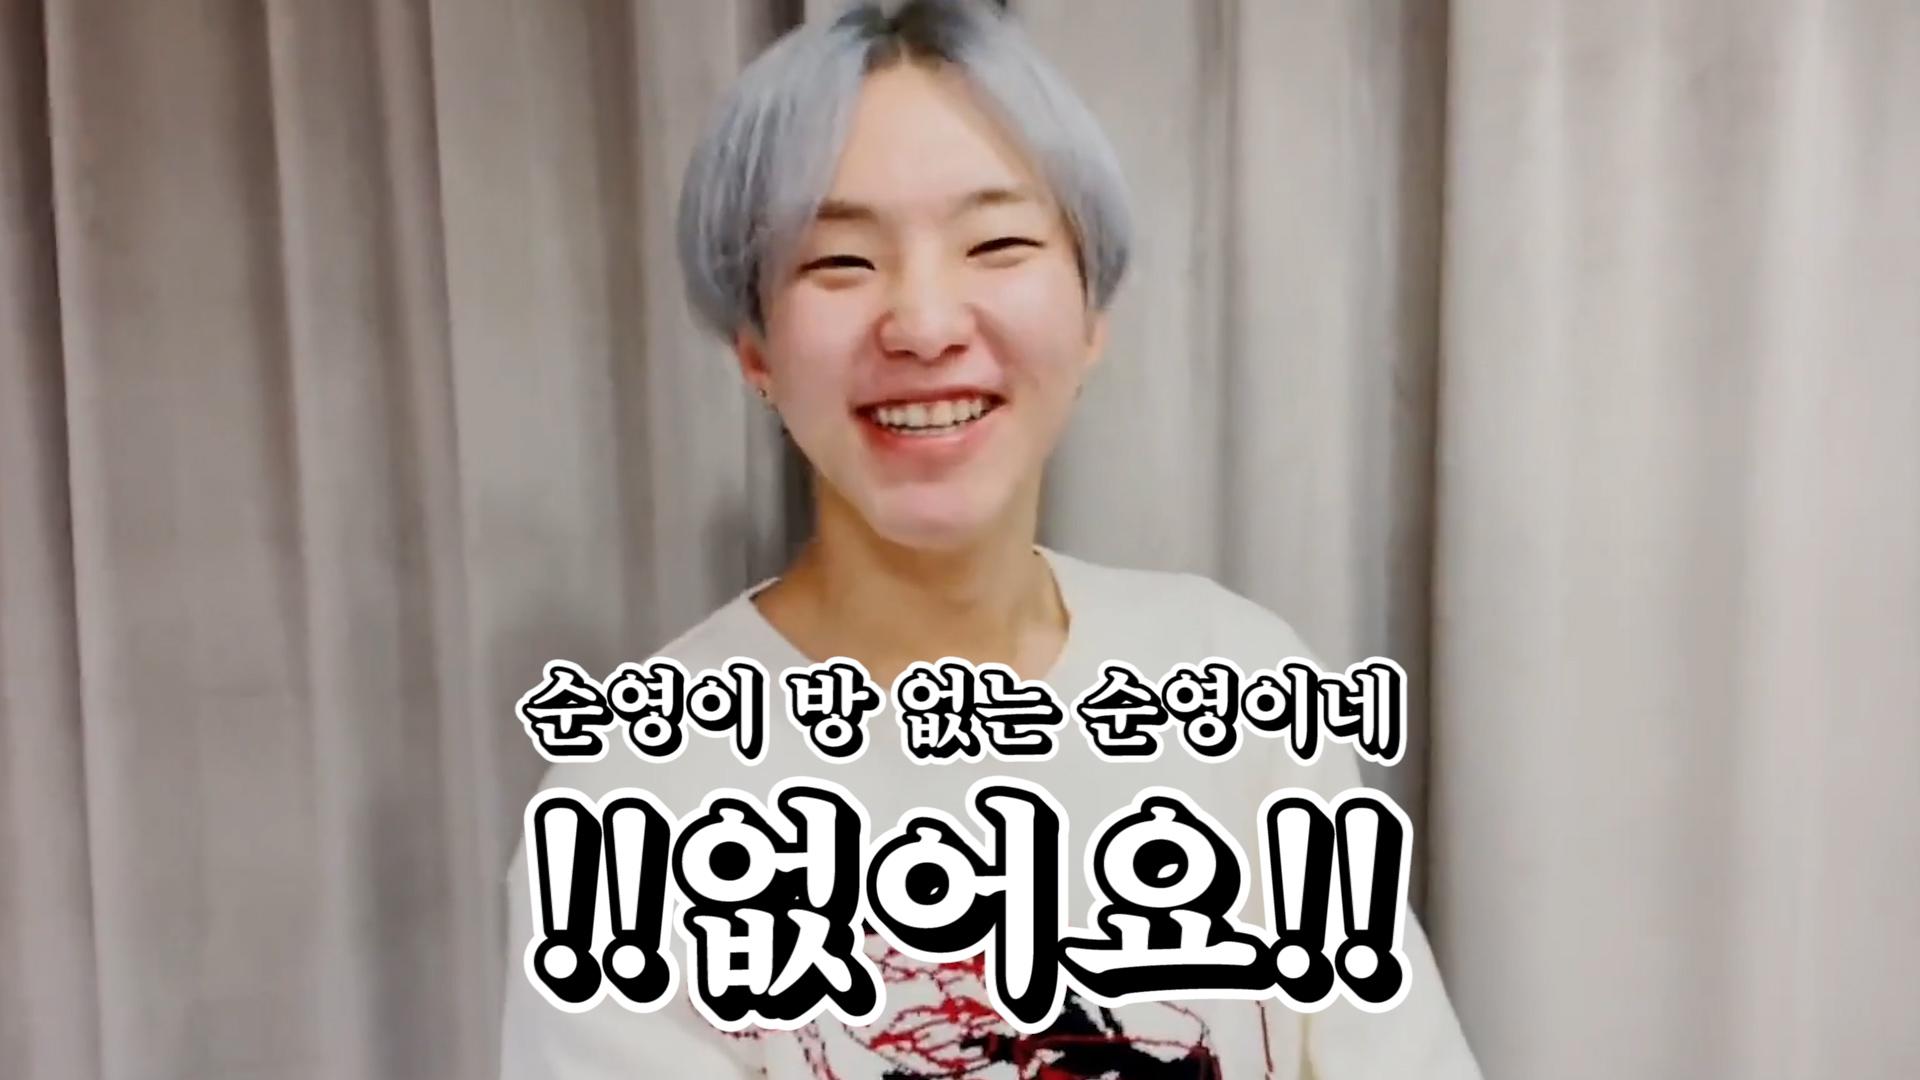 [SEVENTEEN] 🐯호시 방 없는(!!) 호시하우스 랜선 집들이🏡 (HOSHI showing his house)